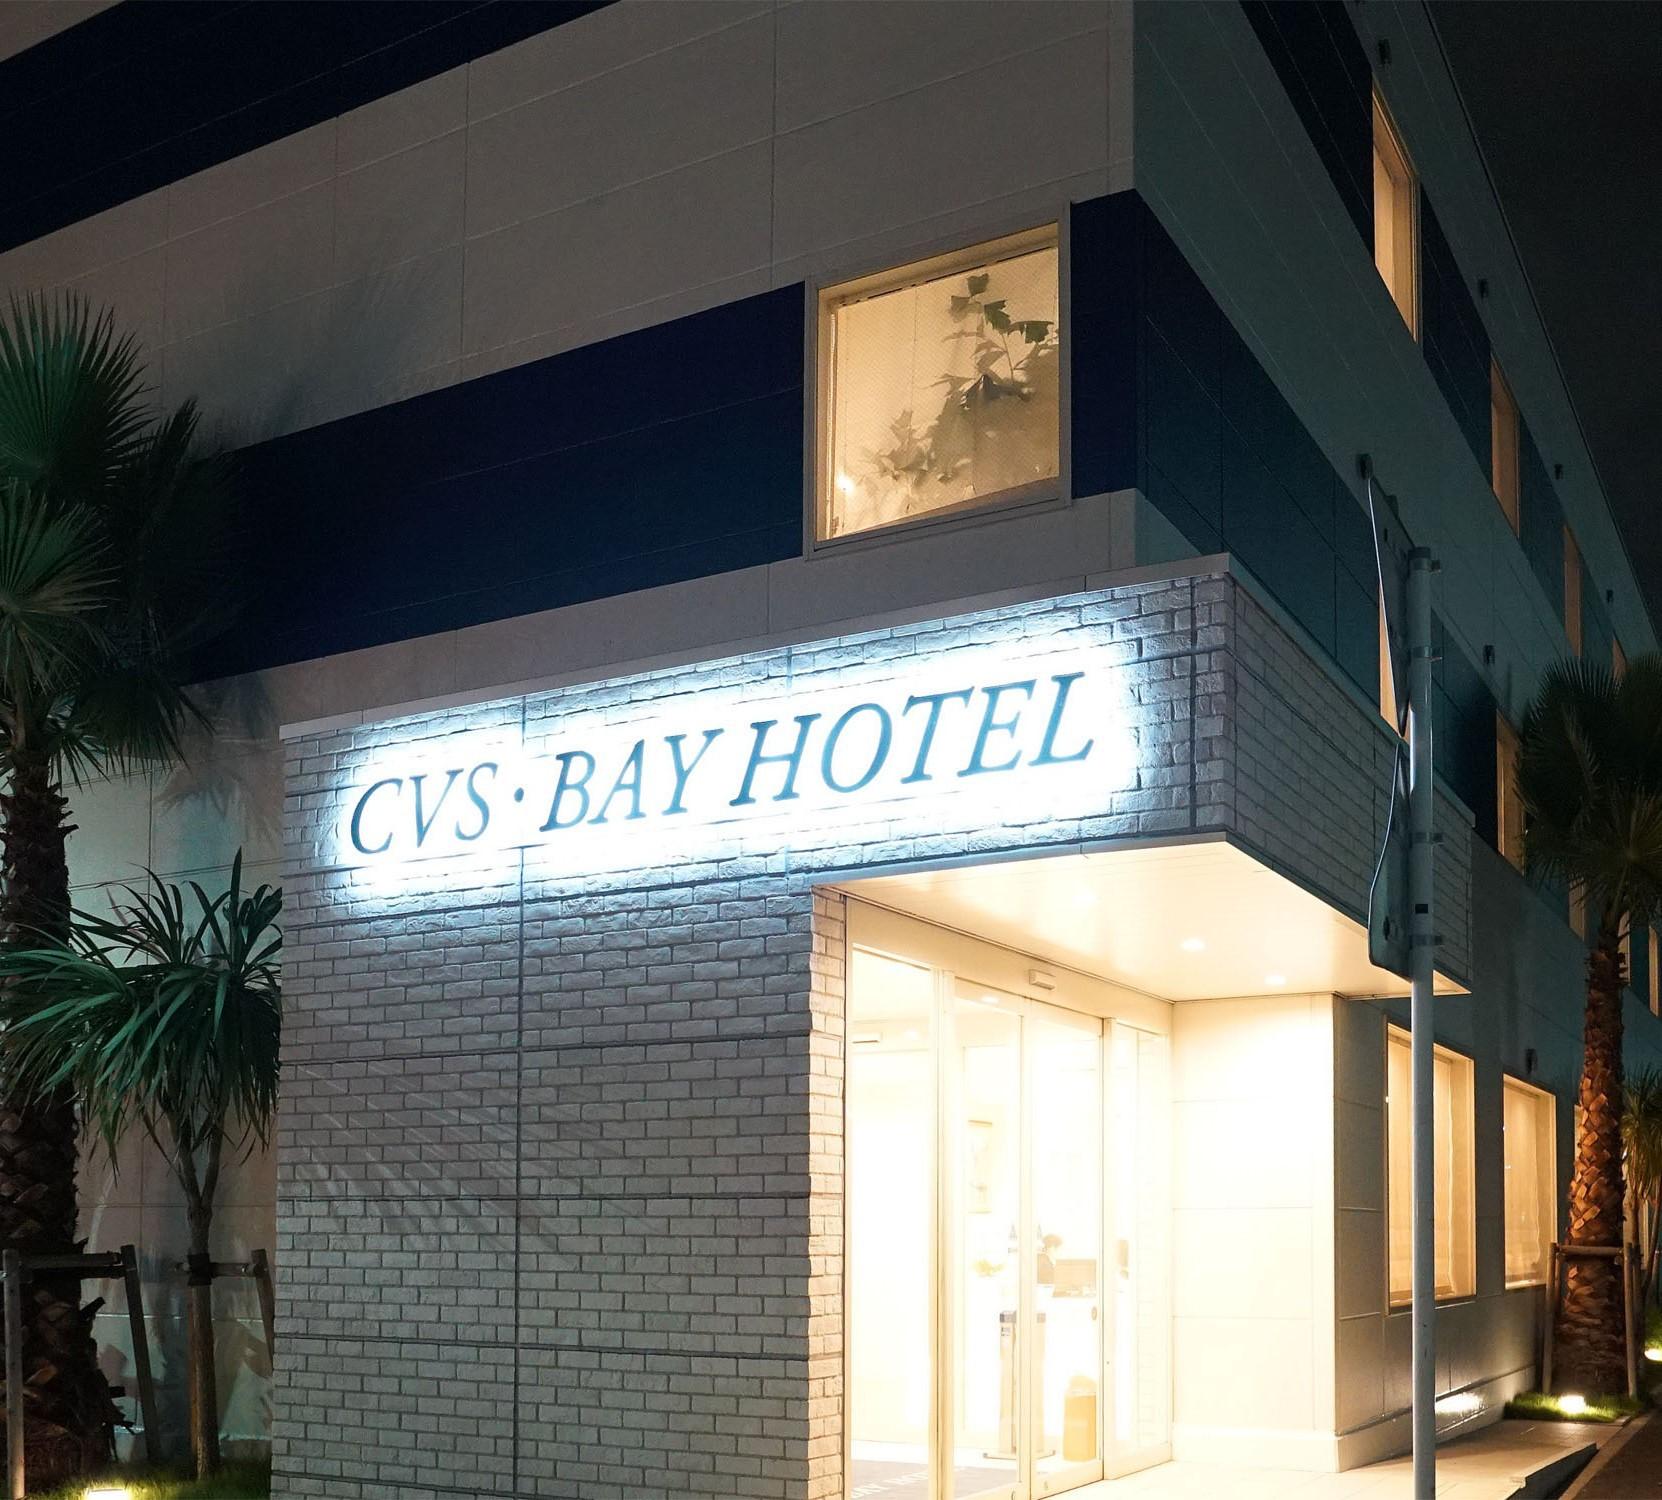 CVS・BAY HOTEL 新館(2015年12月17日オープン)